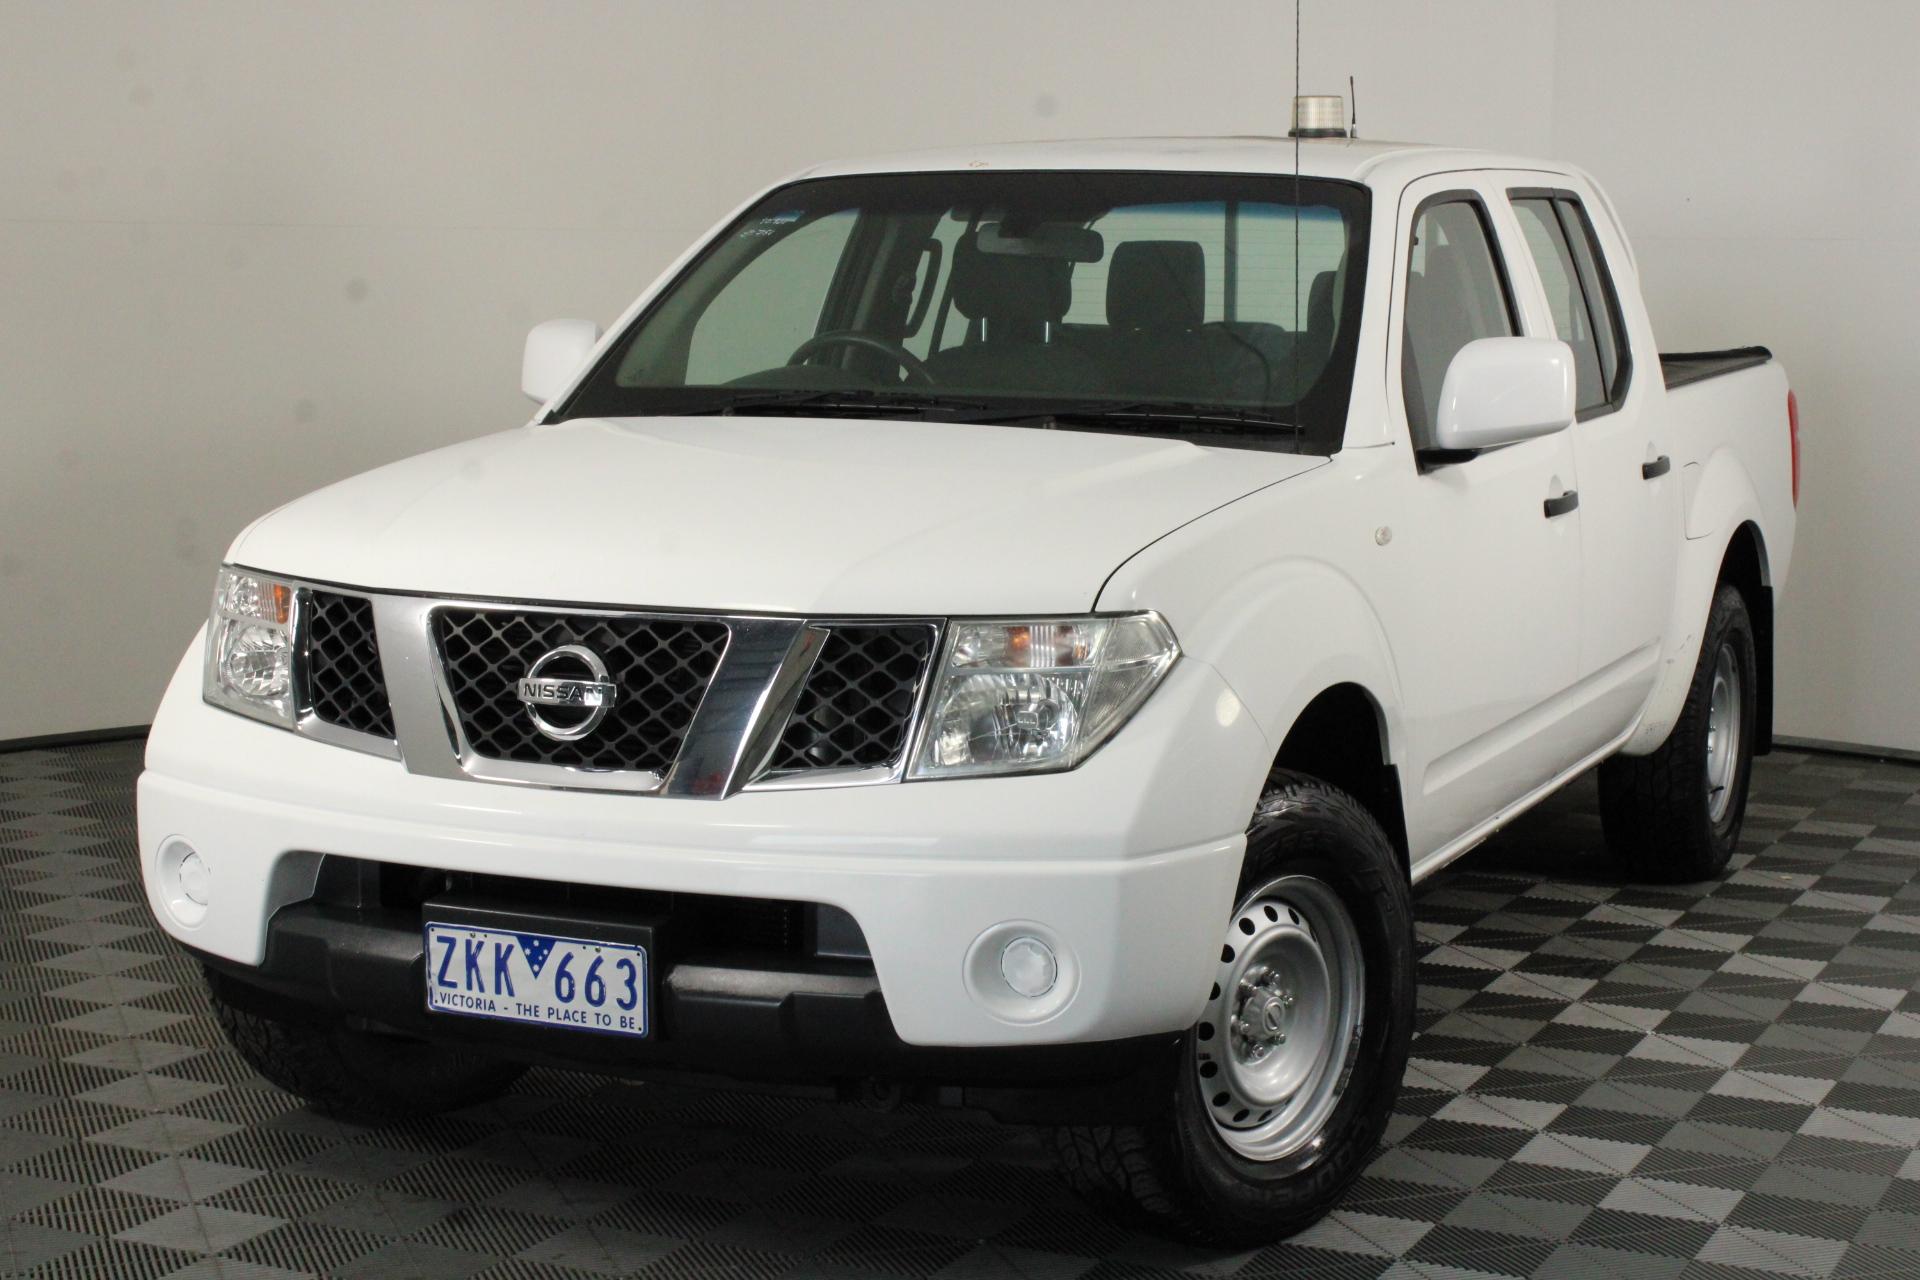 2012 Nissan Navara 4X4 RX D40 Turbo Diesel Automatic (EX GOV)